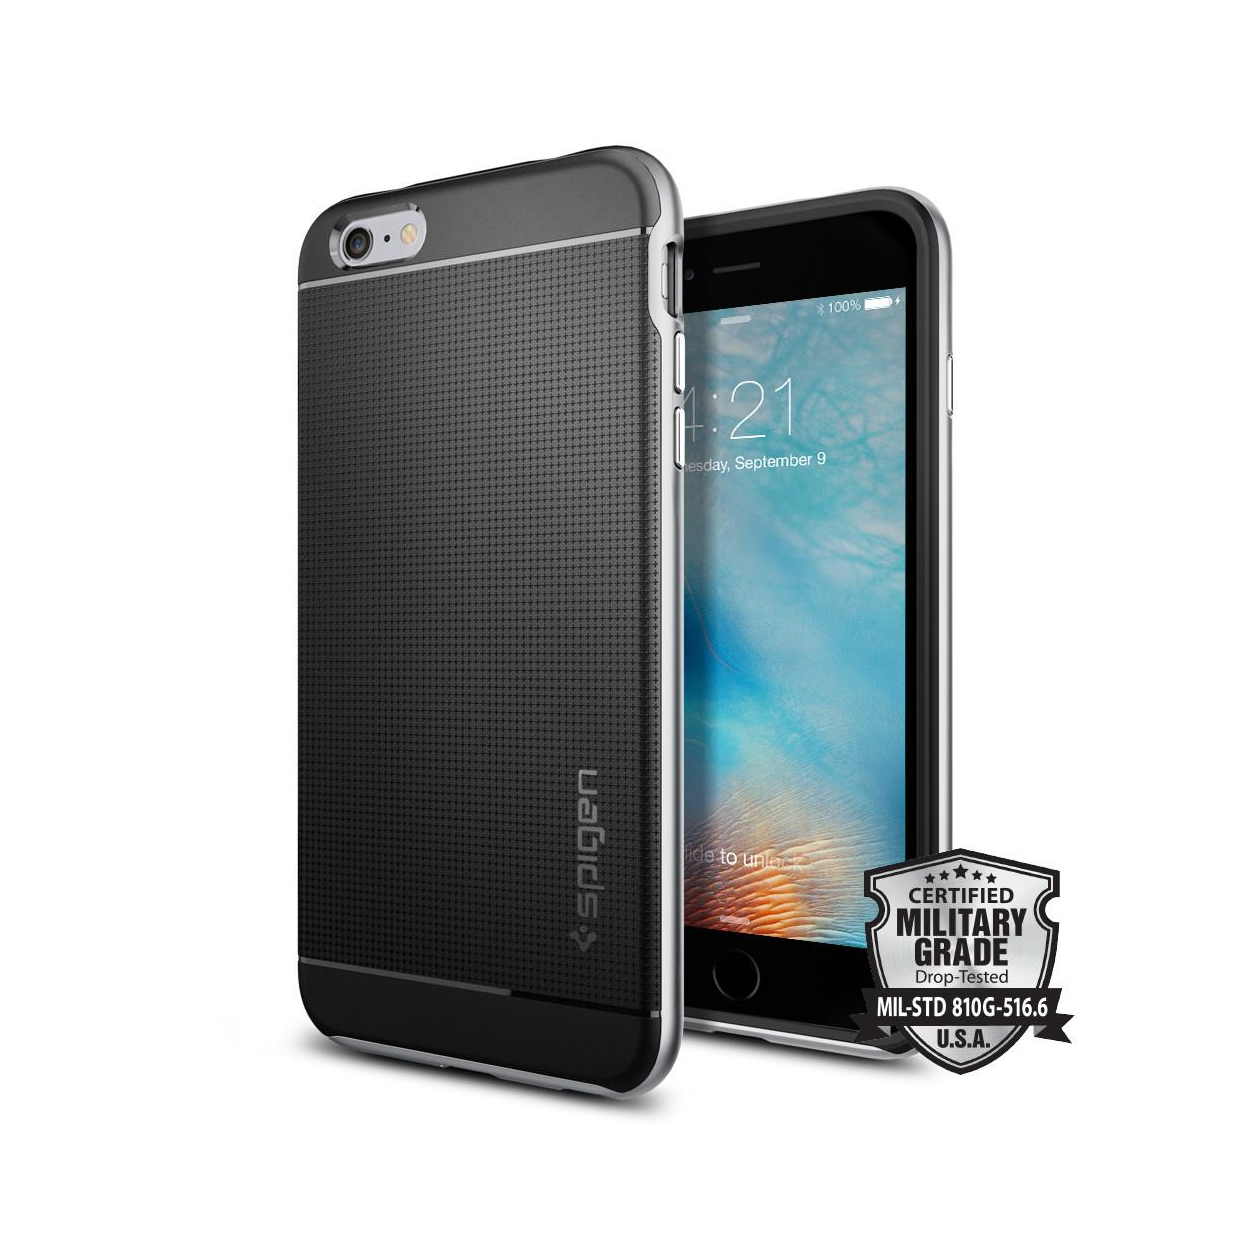 jual spigen neo hybrid iphone 6 plus 6s plus tokopedia. Black Bedroom Furniture Sets. Home Design Ideas